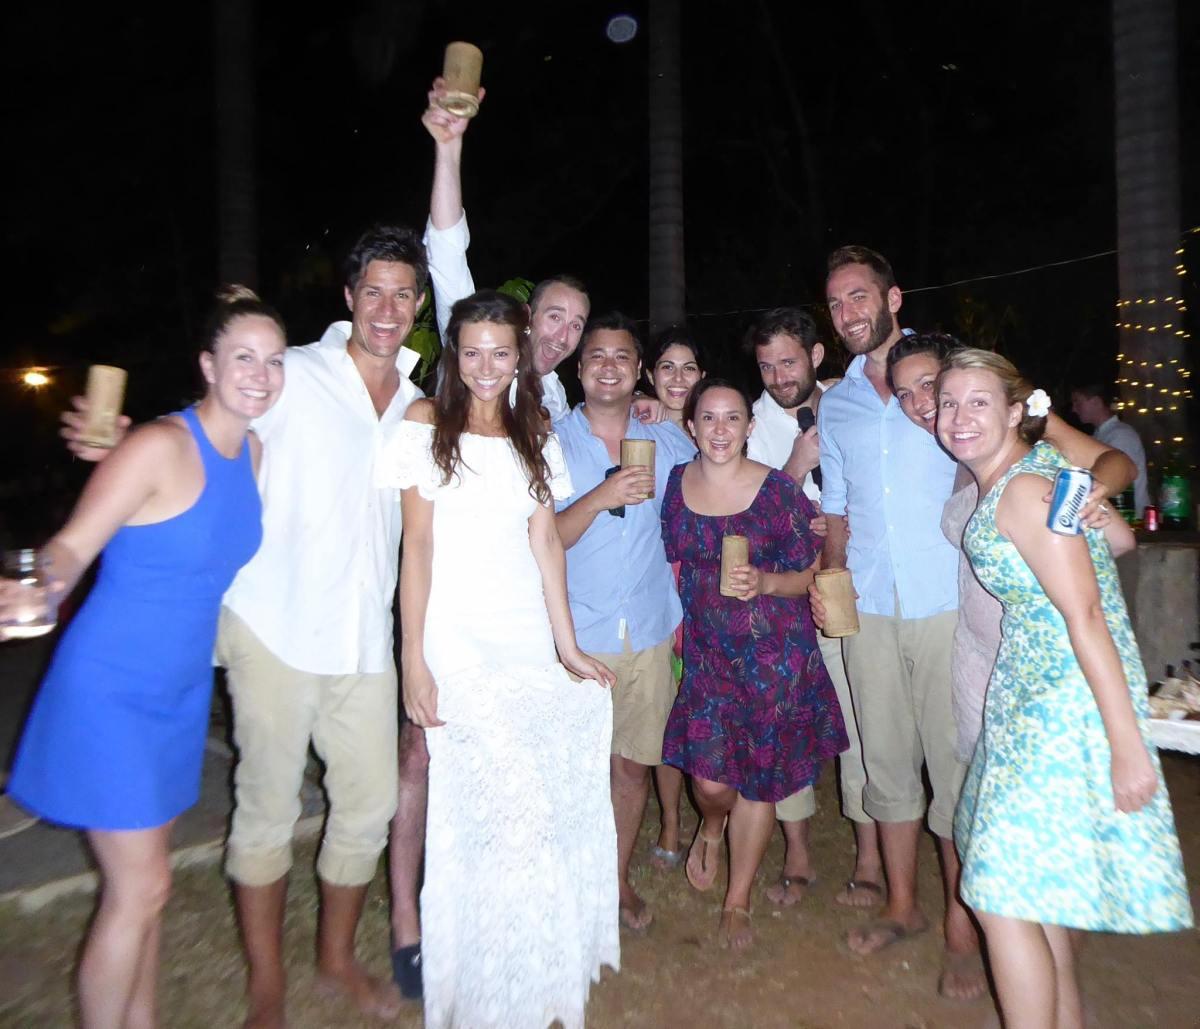 Oksana and Australian friends at the wedding. Costa Rica